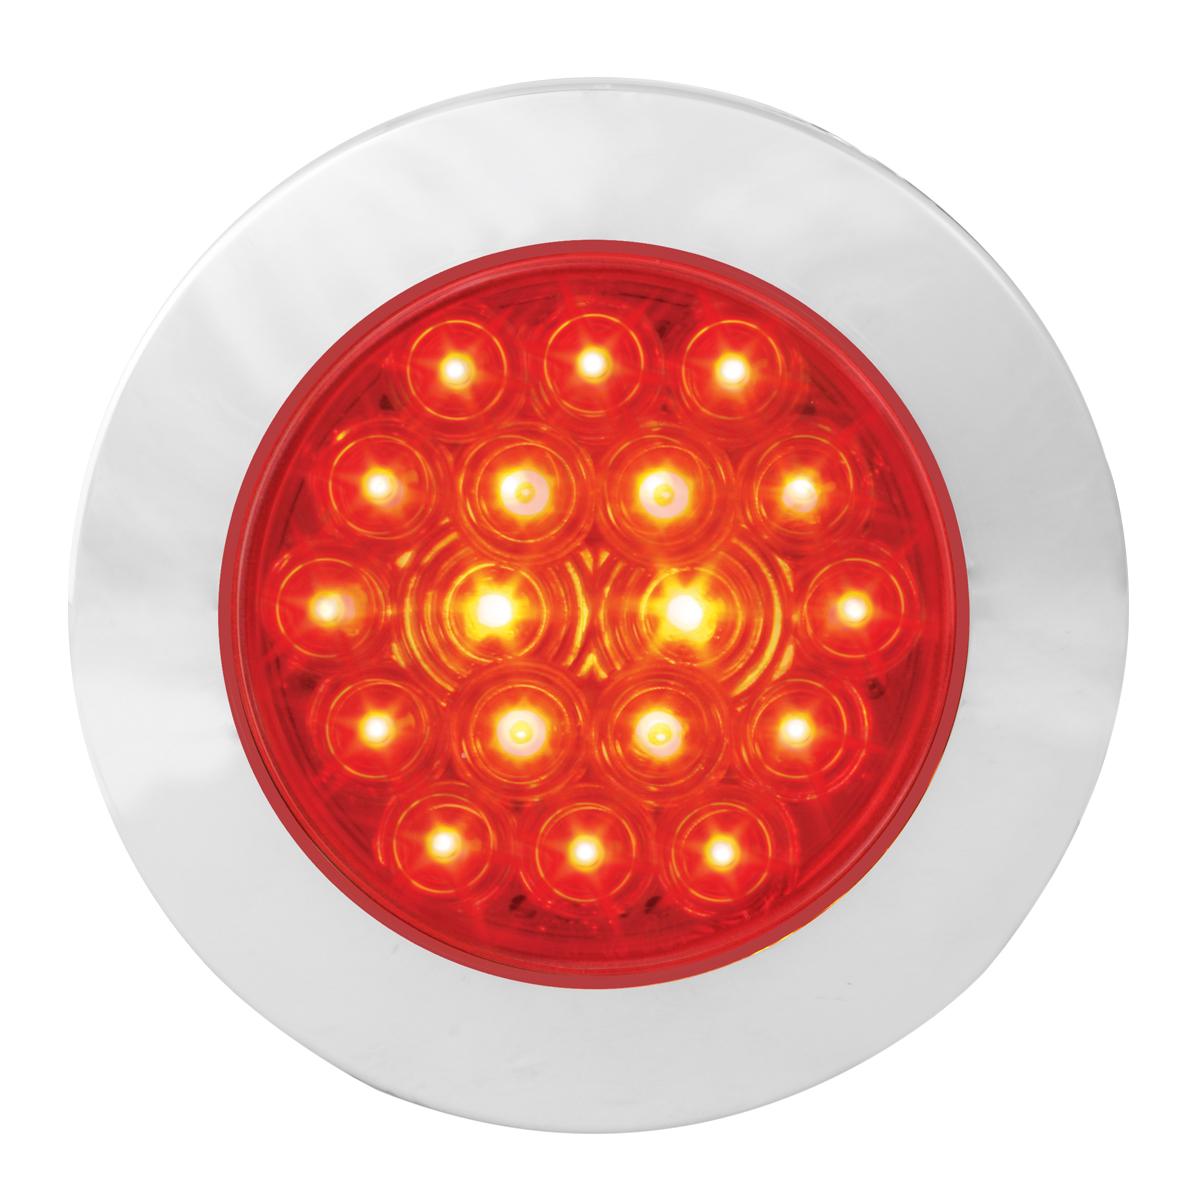 "75902 Red/Red 4"" Fleet Flange Mount LED Light with Chrome Twist & Lock Bezel"